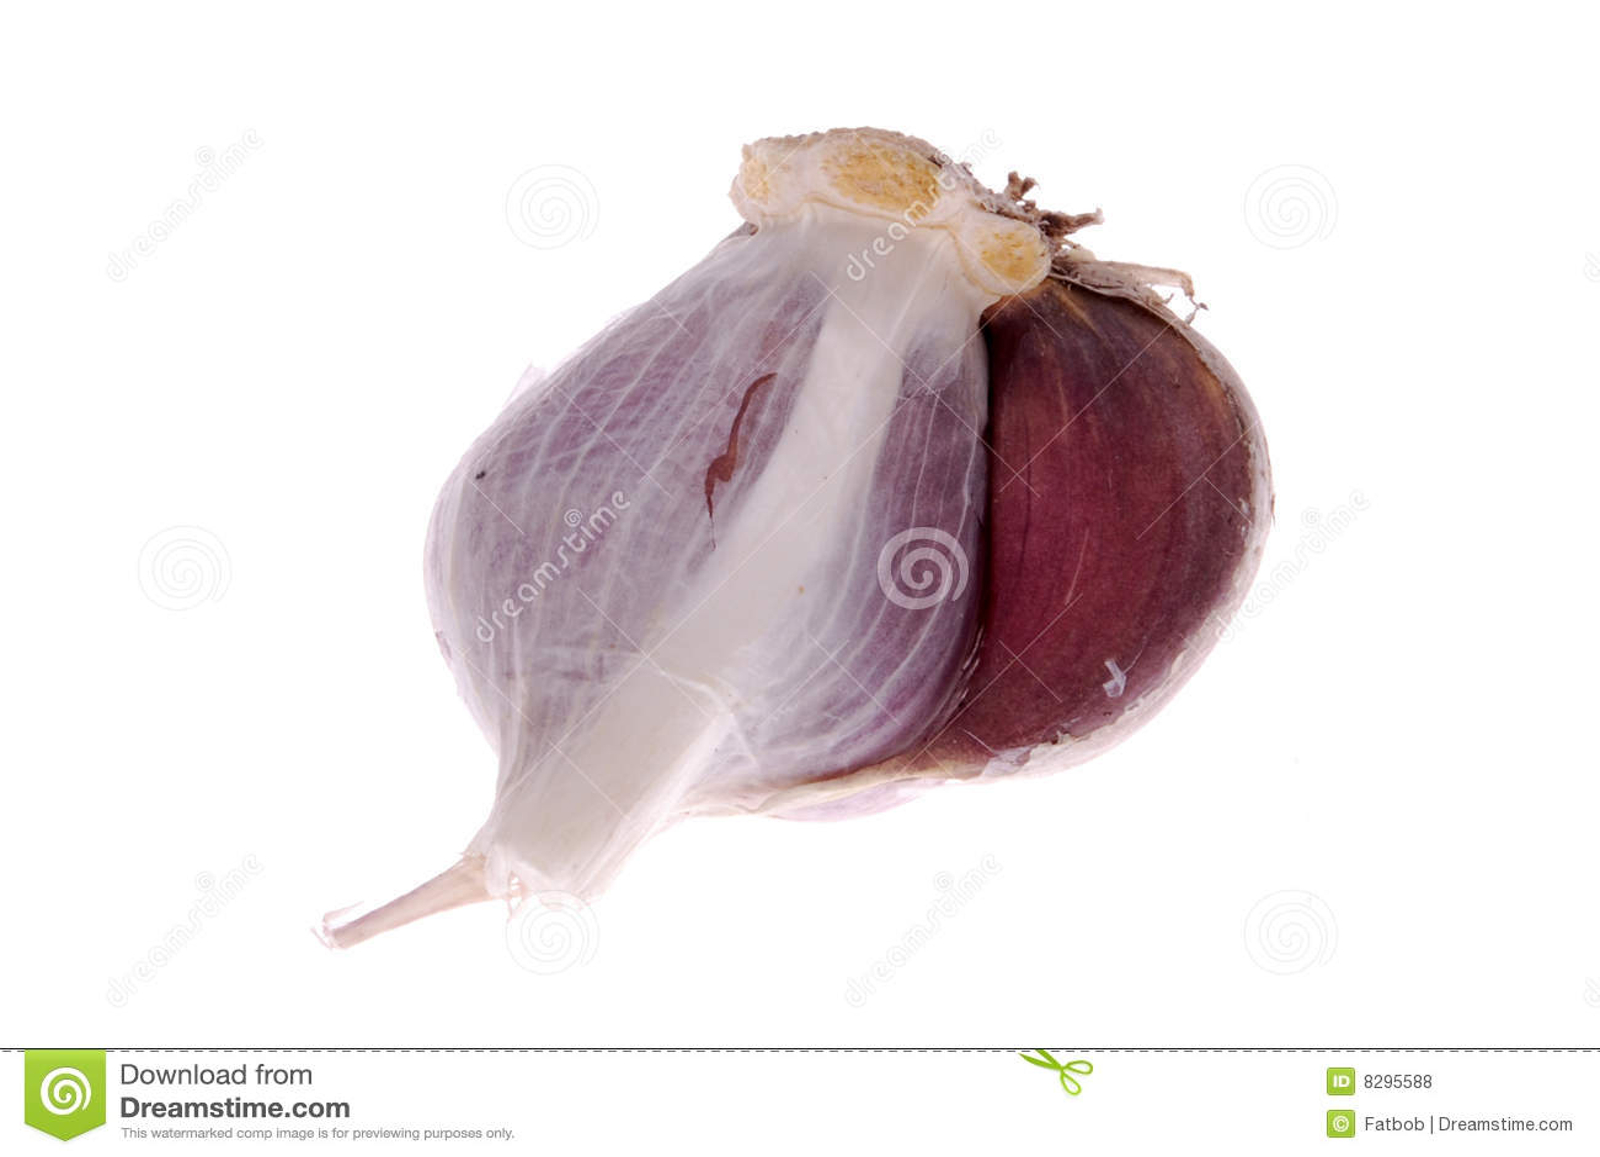 how to open garlic bulb